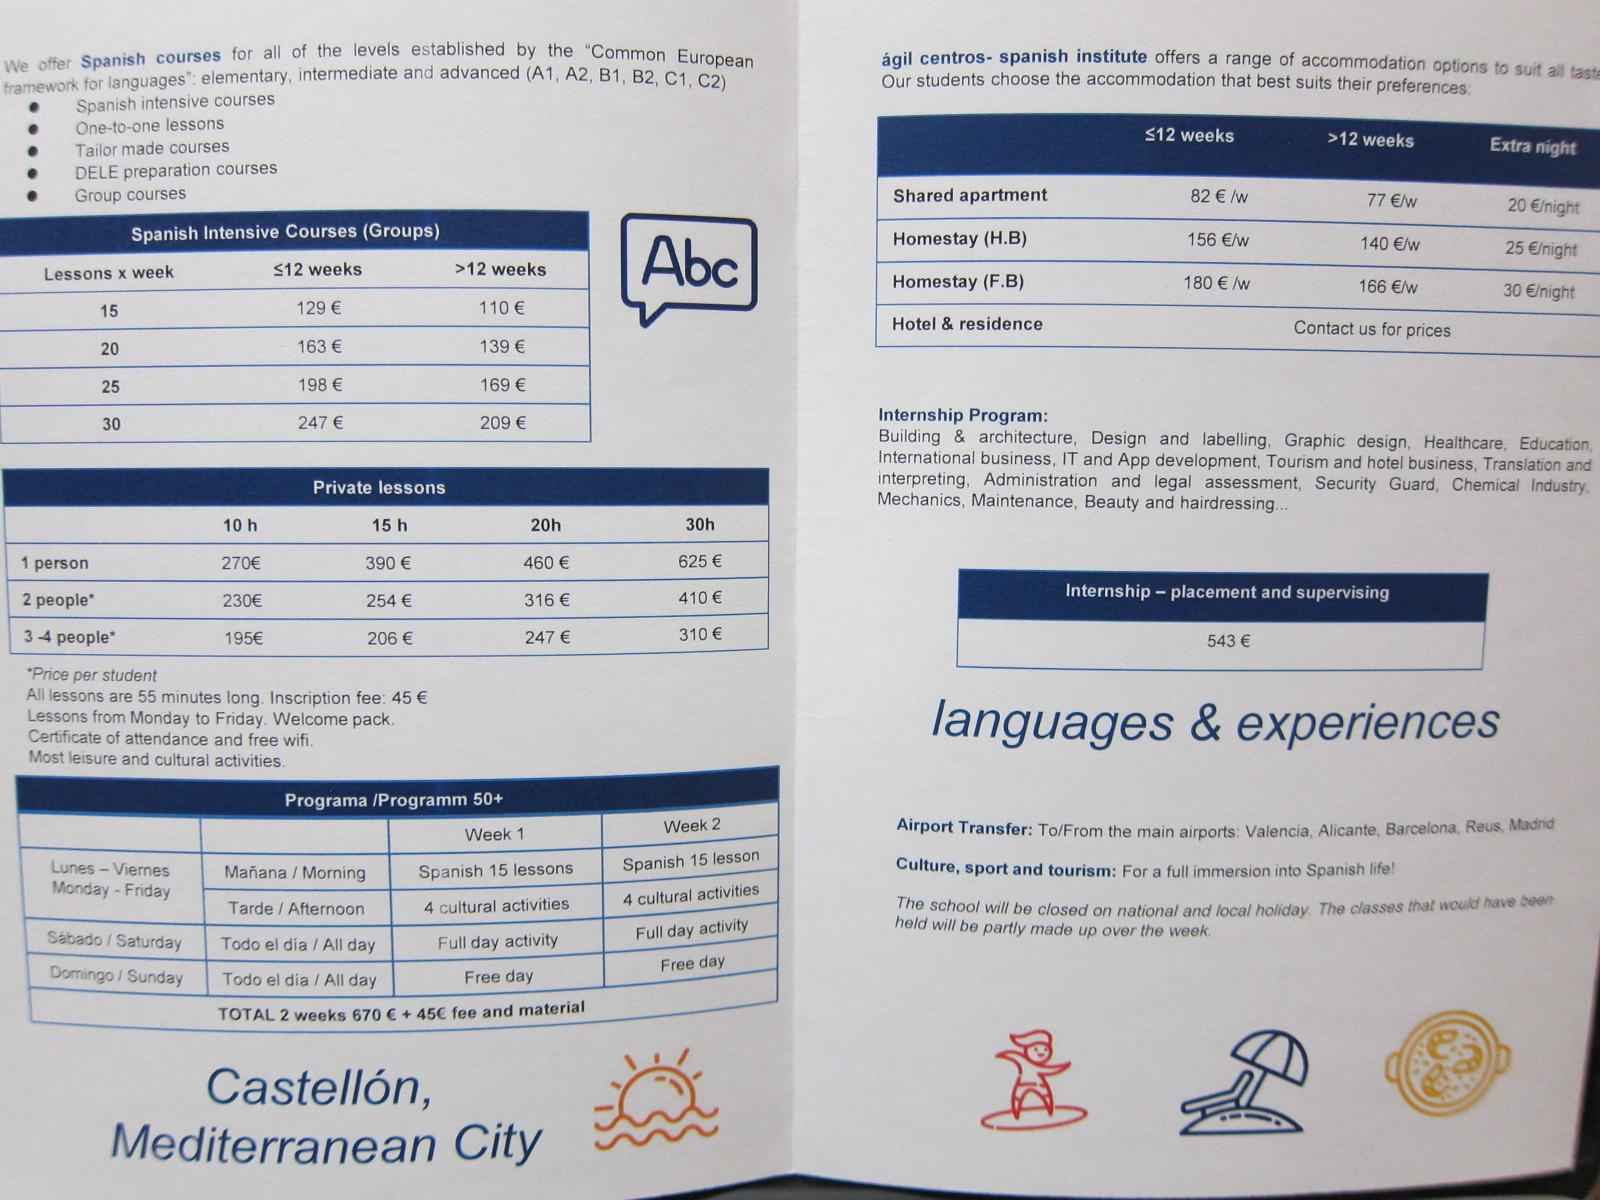 Learn Spanish in Castellon AGIL